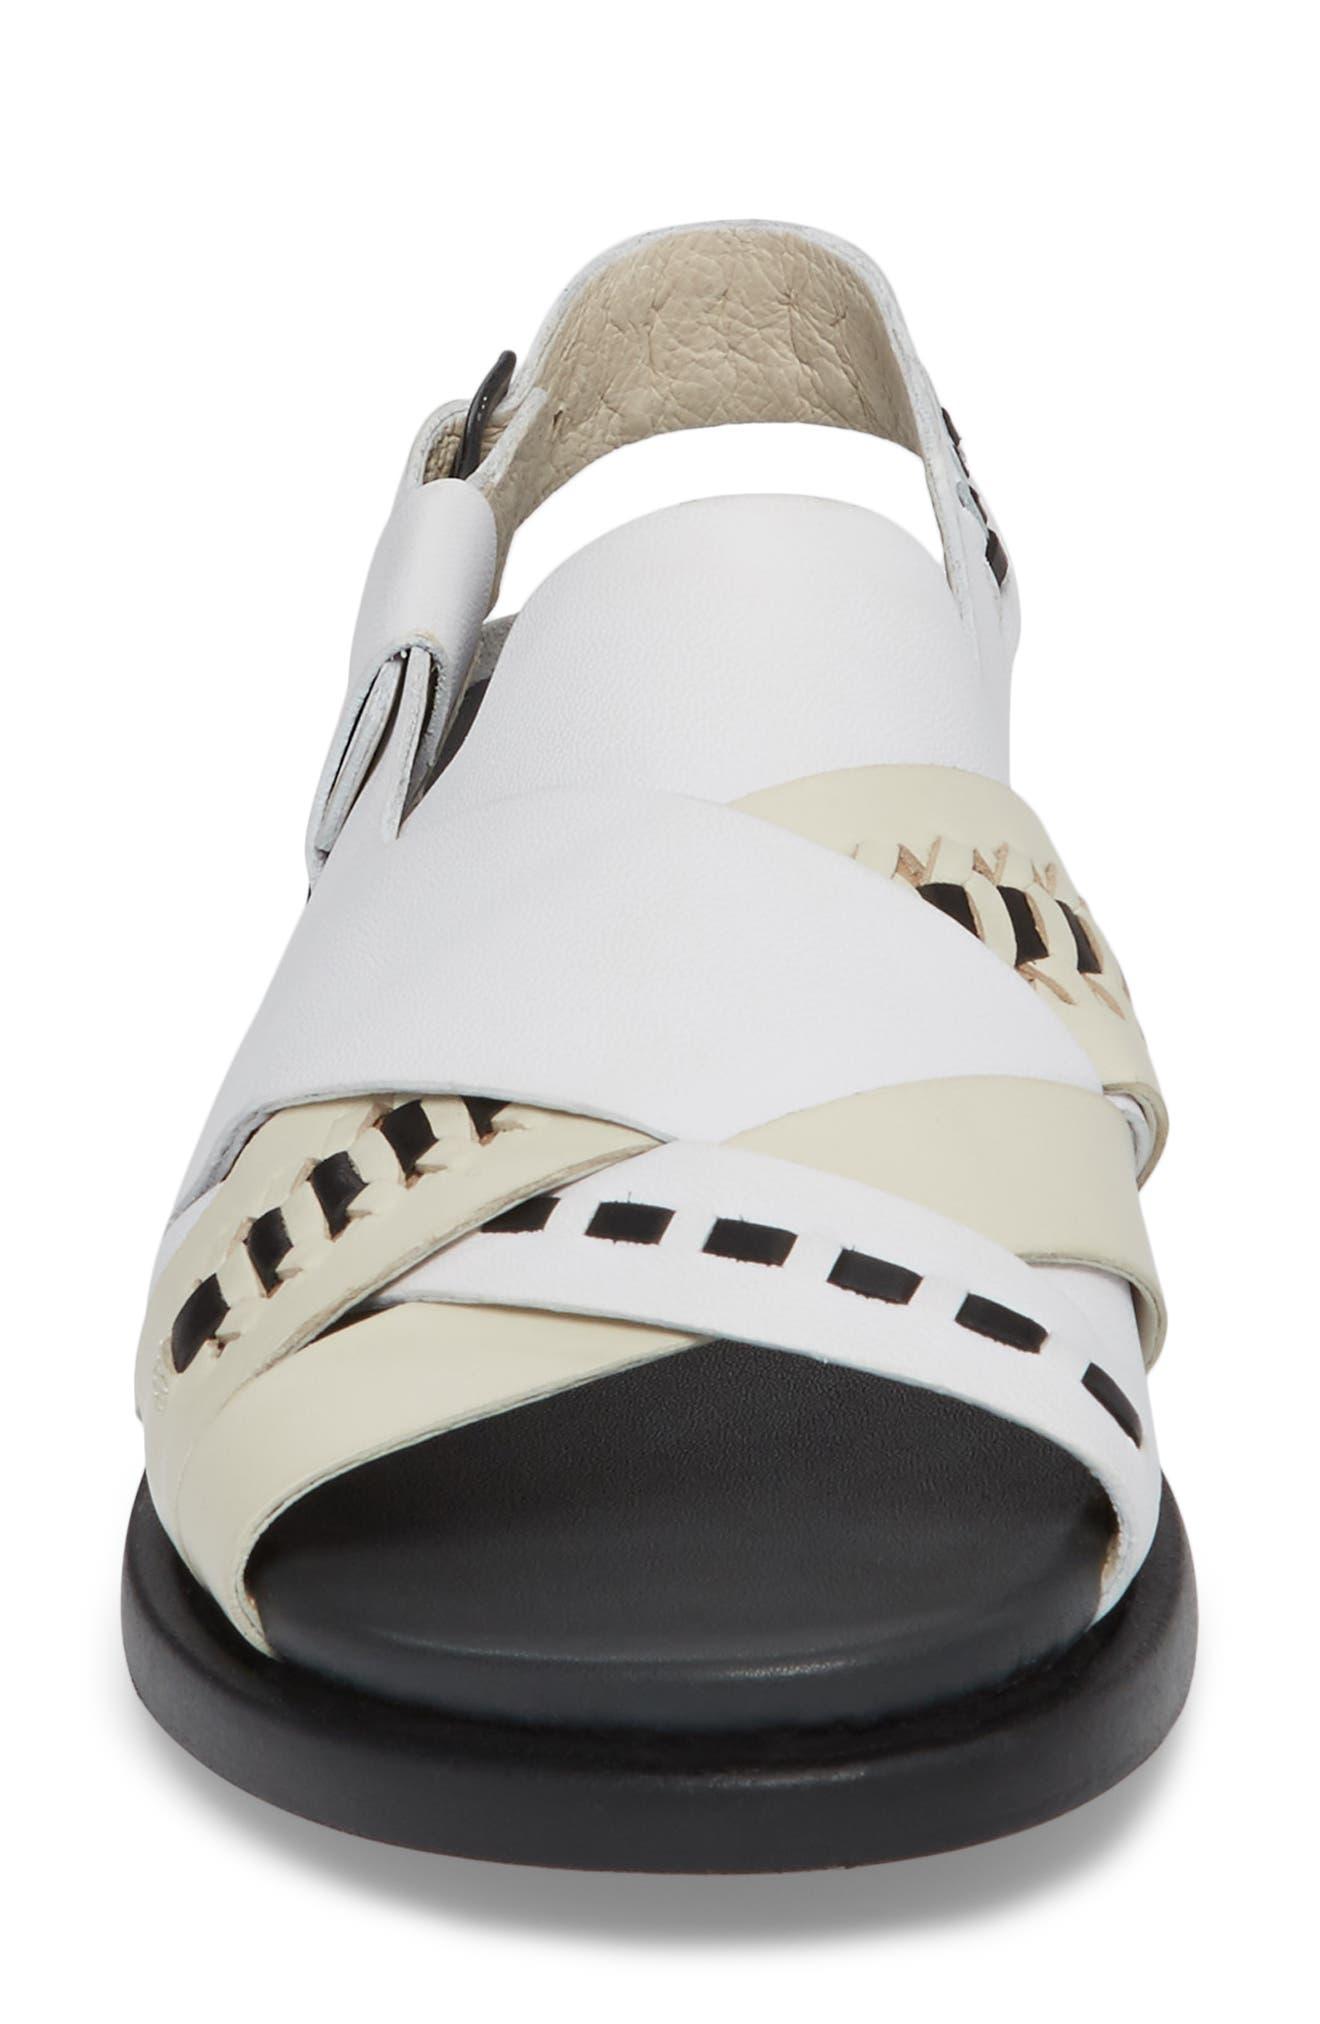 Twins Slingback Sandal,                             Alternate thumbnail 8, color,                             Multi - Assorted Leather